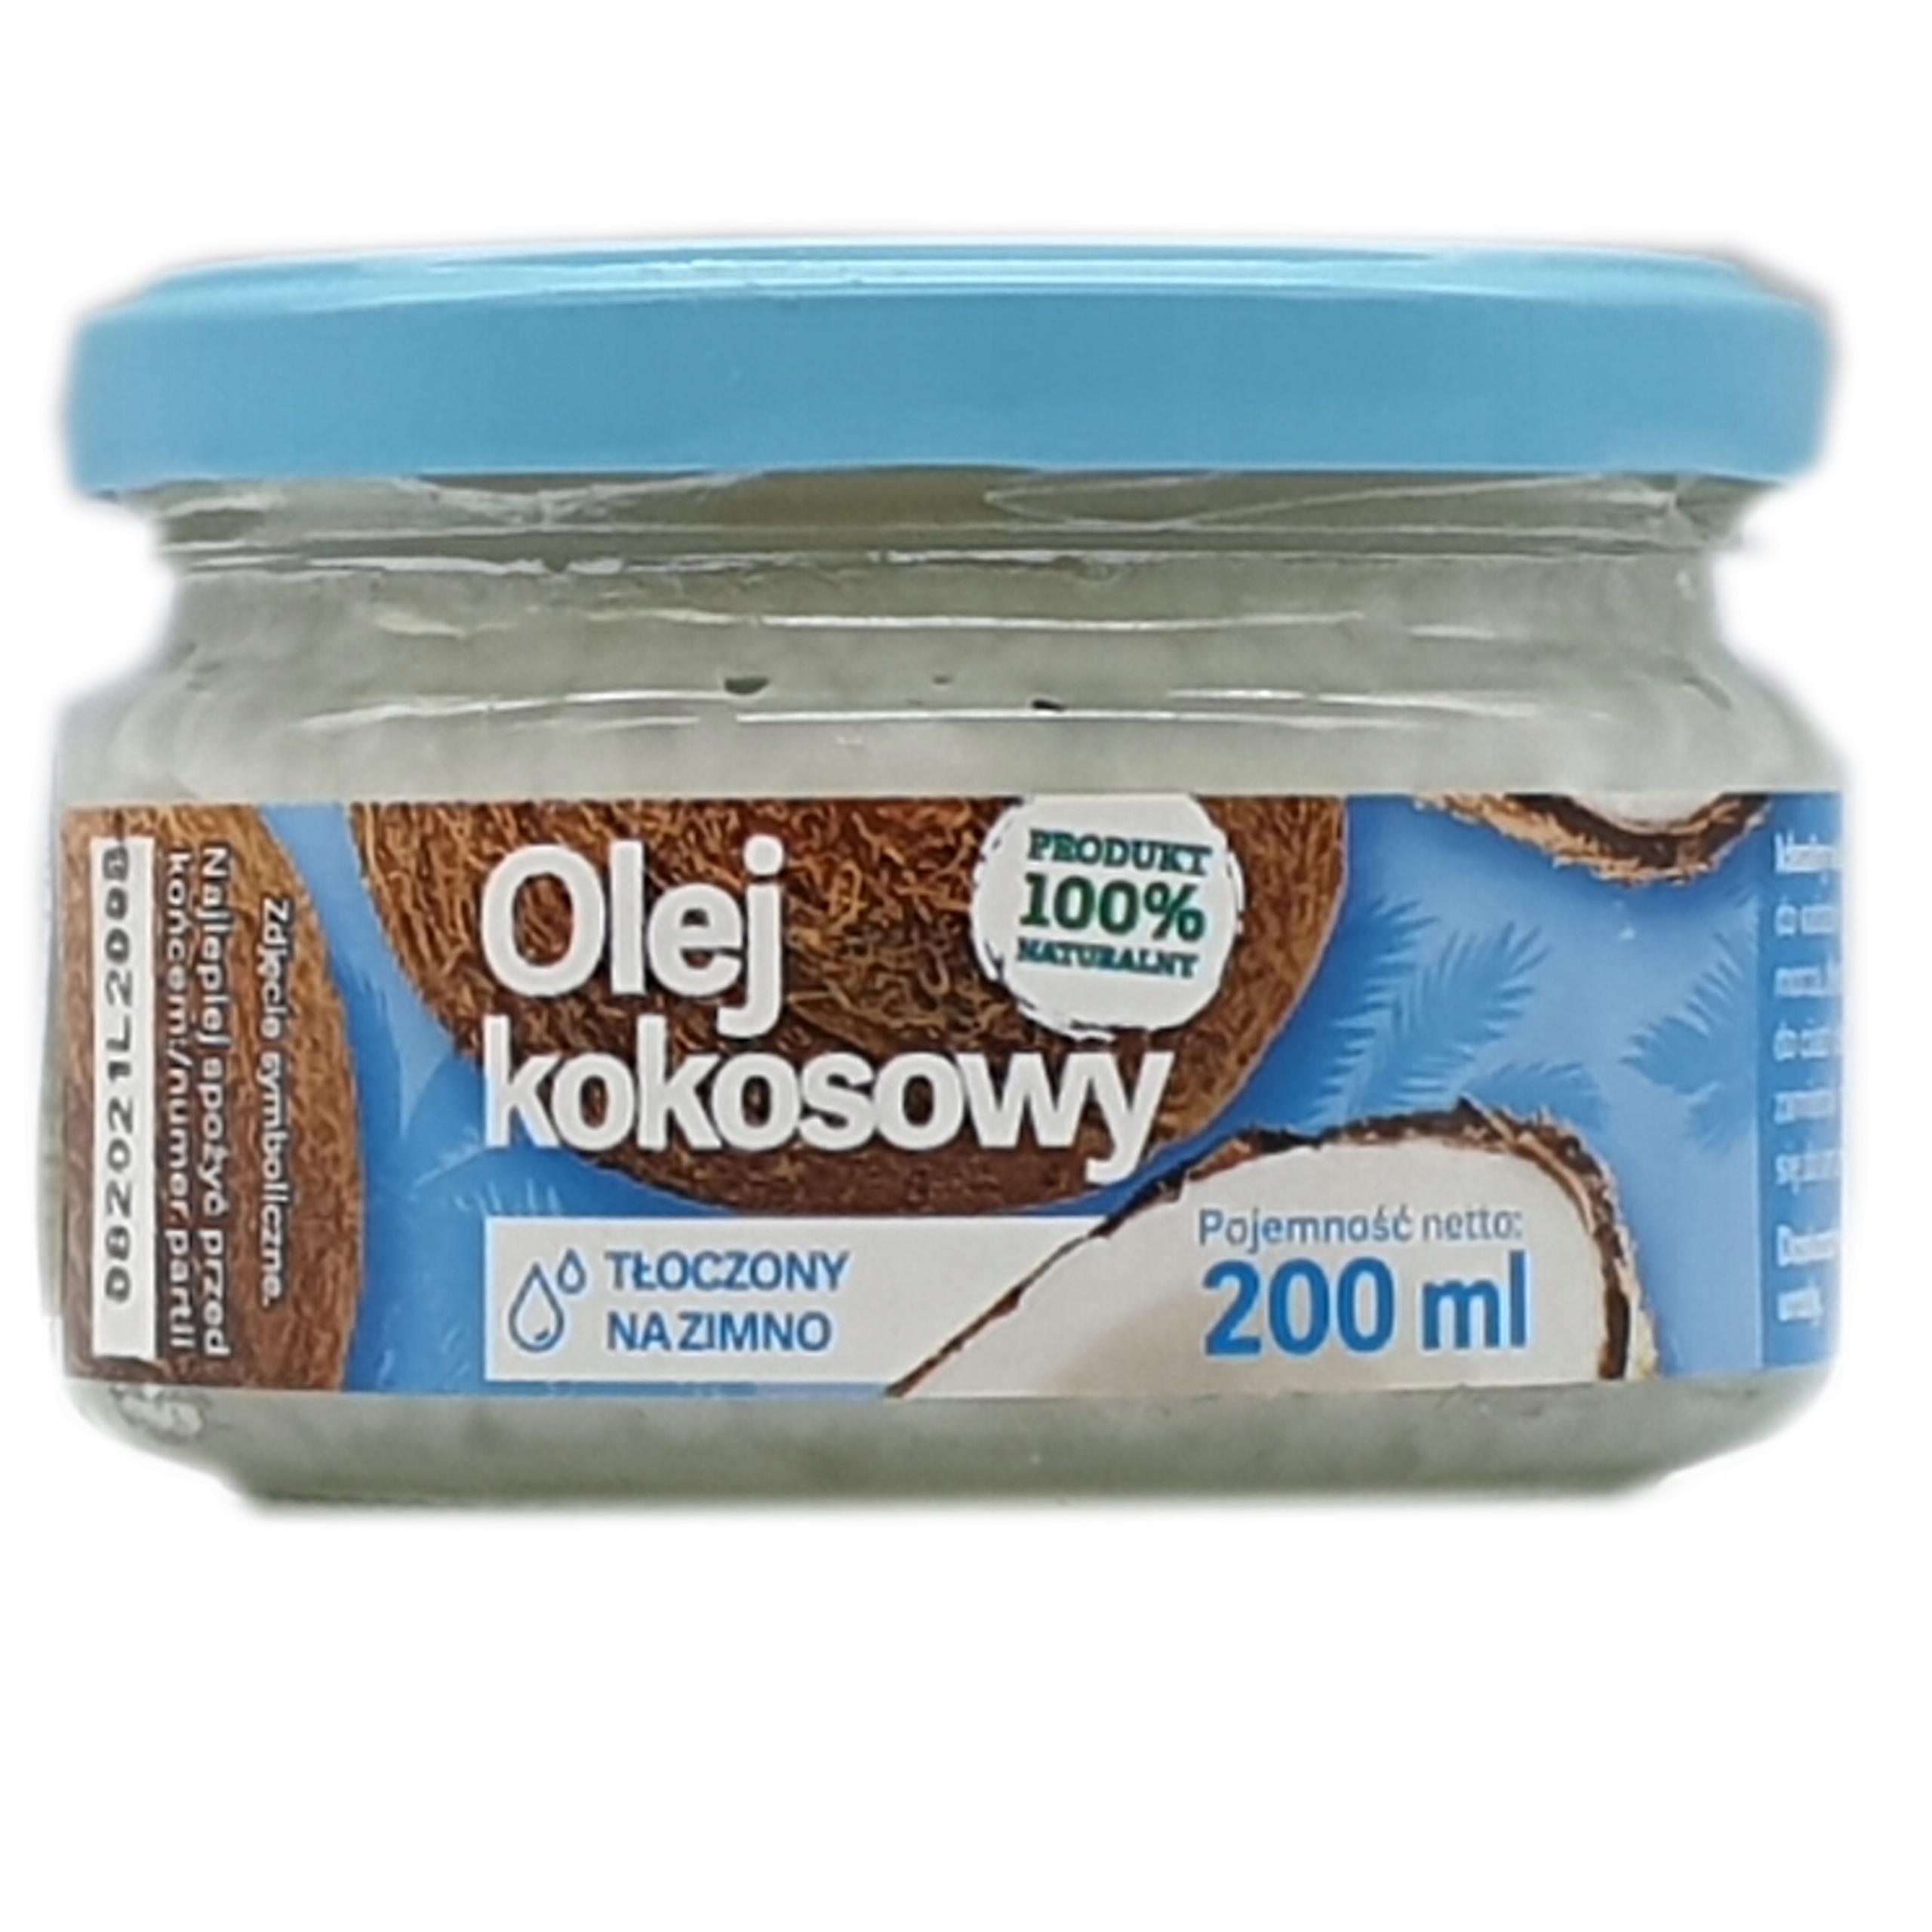 Кокосовое масло холодного отжима 200 мл ДАТА 10/2021